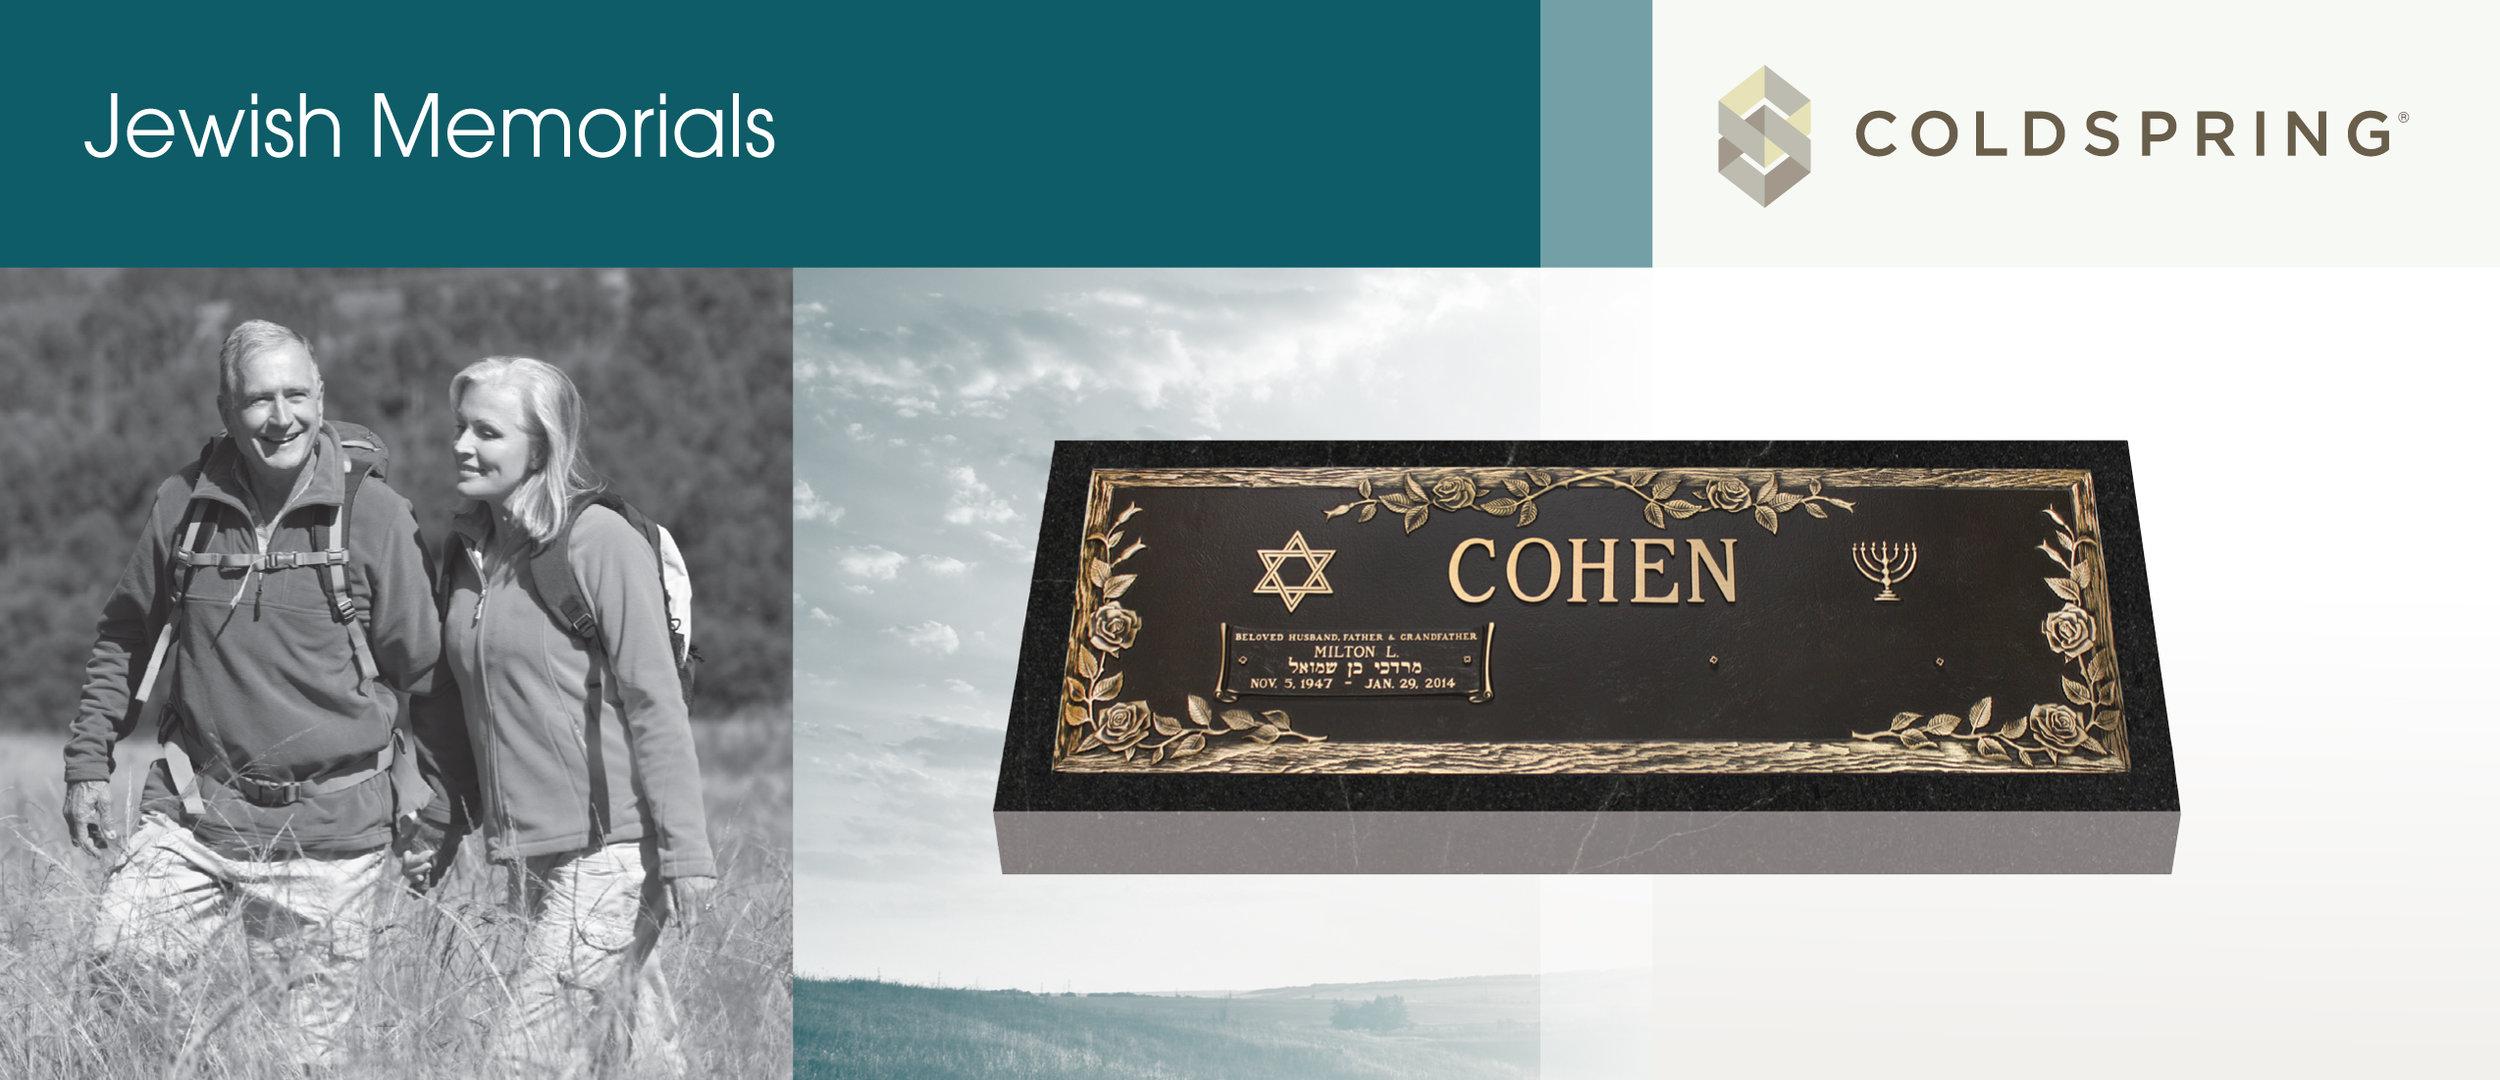 Coldspring Jewish